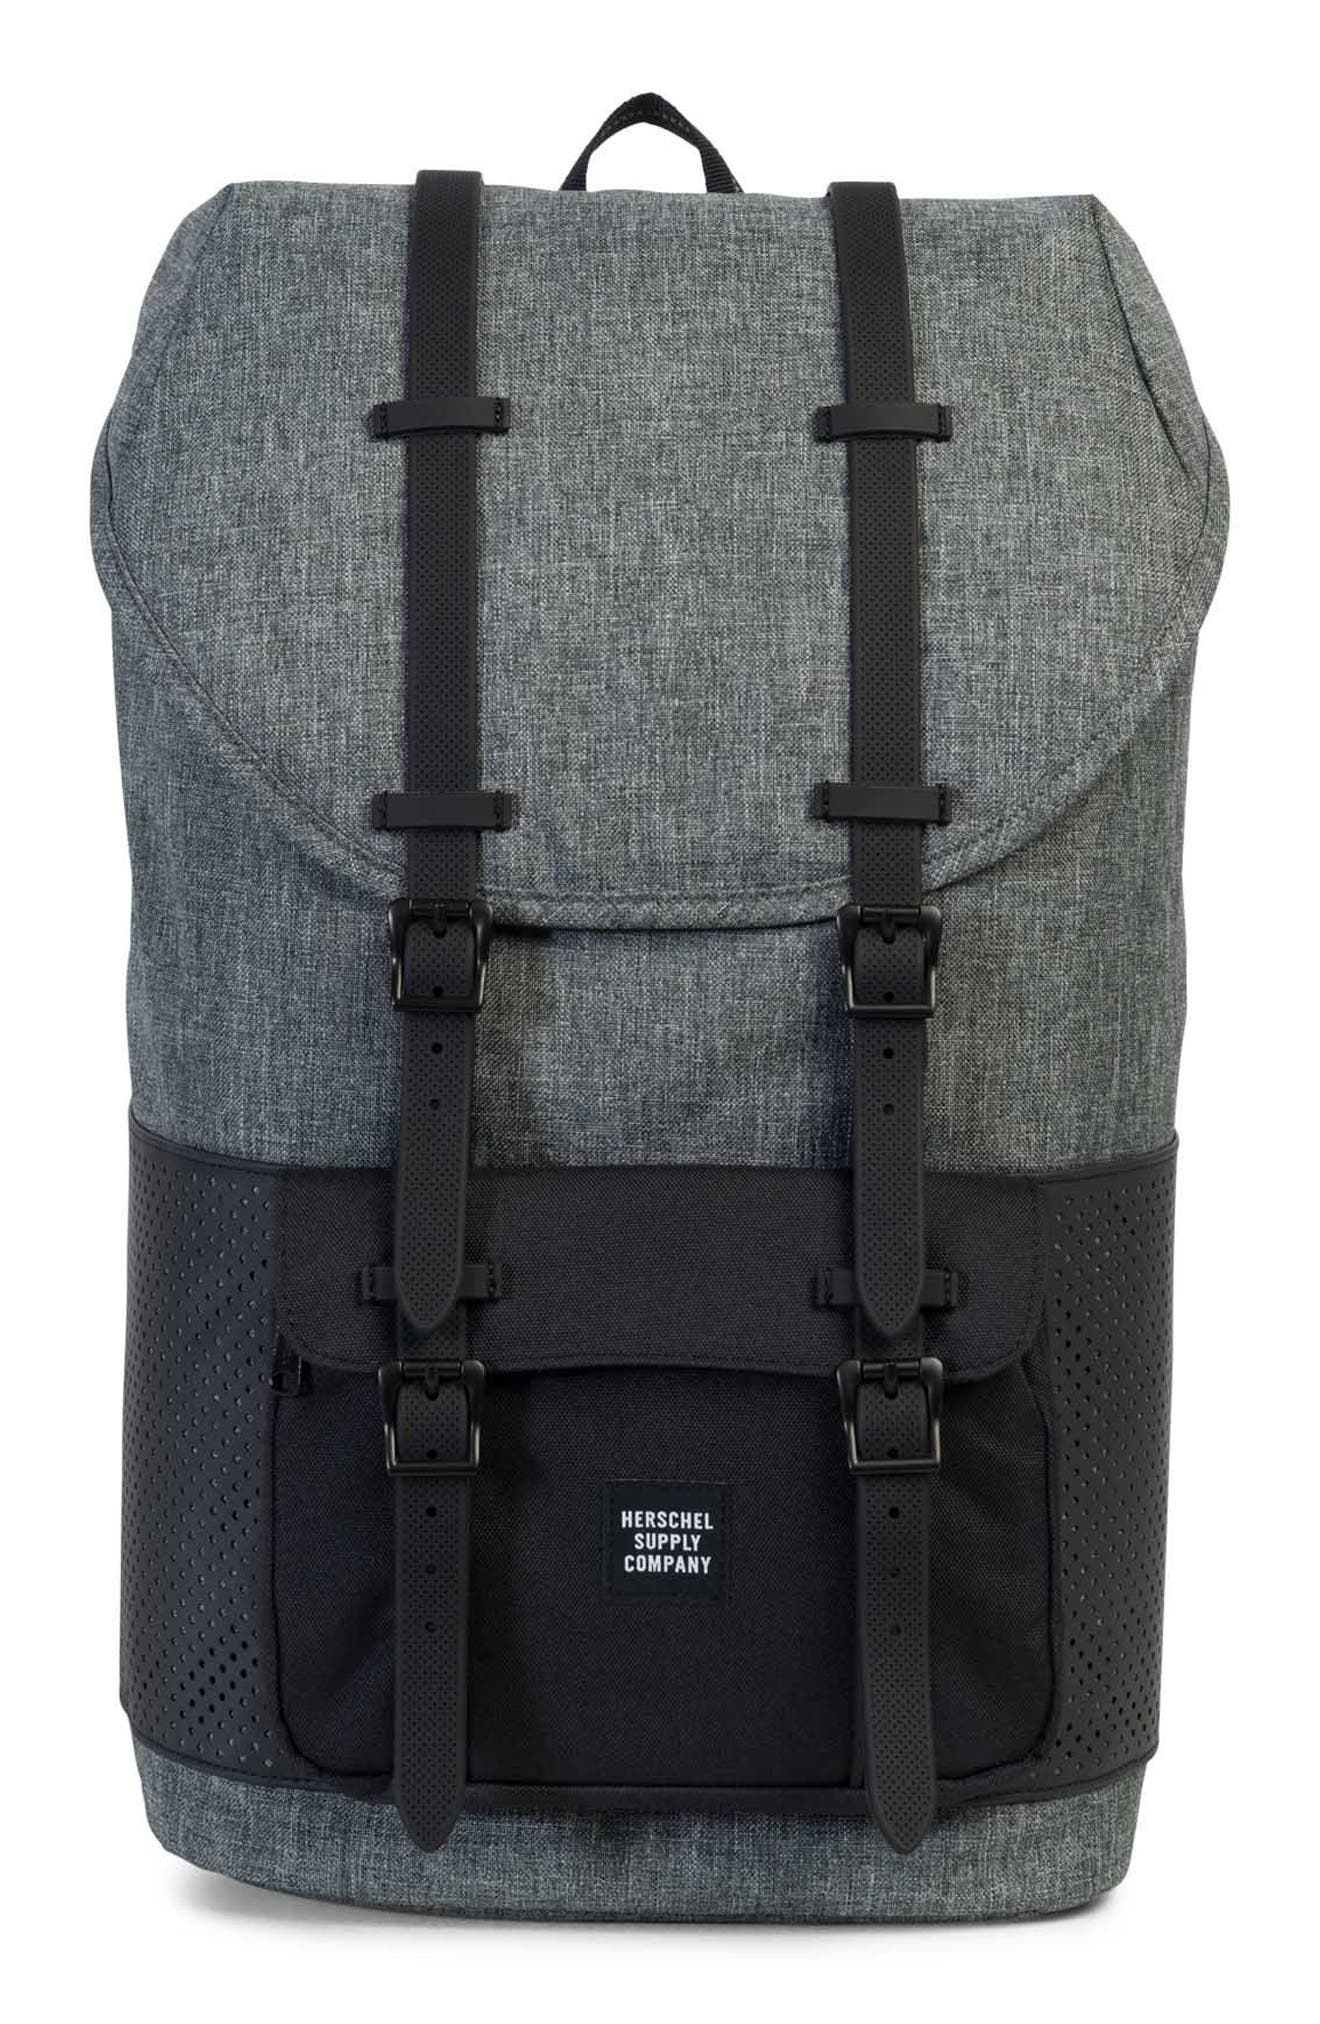 Alternate Image 1 Selected - Herschel Supply Co. Little America Aspect Backpack